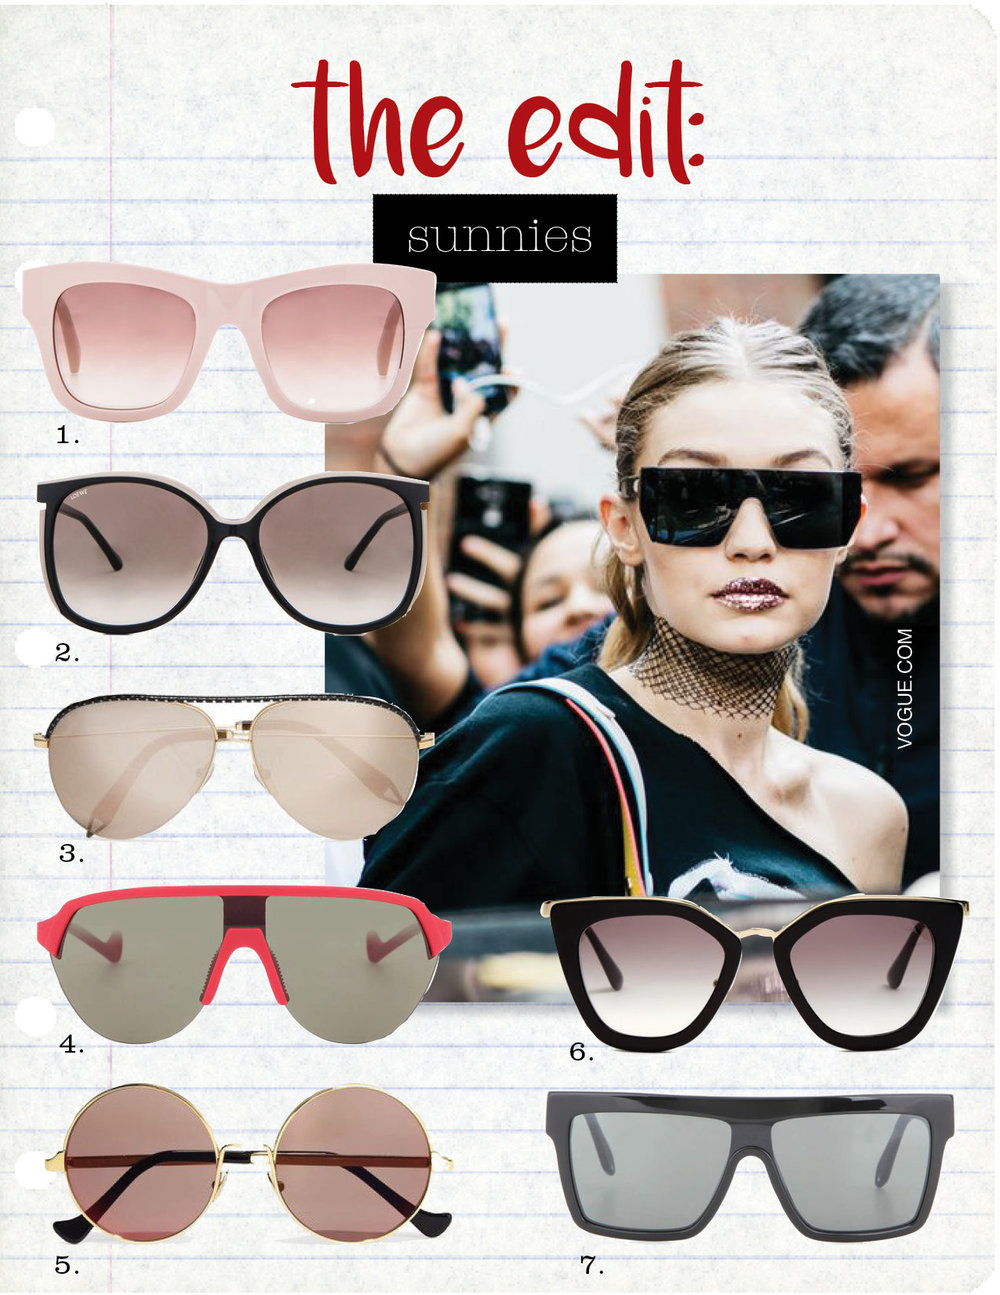 1. stella maccartney square chain sunglasses, $400,  fwrd.com  2. loewe vedra sunglasses, $330,  fwrd.com  3. victoria beckham aviator gold-tone mirrored sunglasses, $980,  net-a-porter.com  4. district vision nagata district sky g15 sunglasses, $270,  mytheresa.com  5. cutler and gross round-frame gold plated sunglasses, $400,  net-a-porter.com  6. prada eyewear cat-eye acetate sunglasses, $311,  matchesfashion.com  7. victoria beckham flat top visor sunglasses, $450,  mytheresa.com